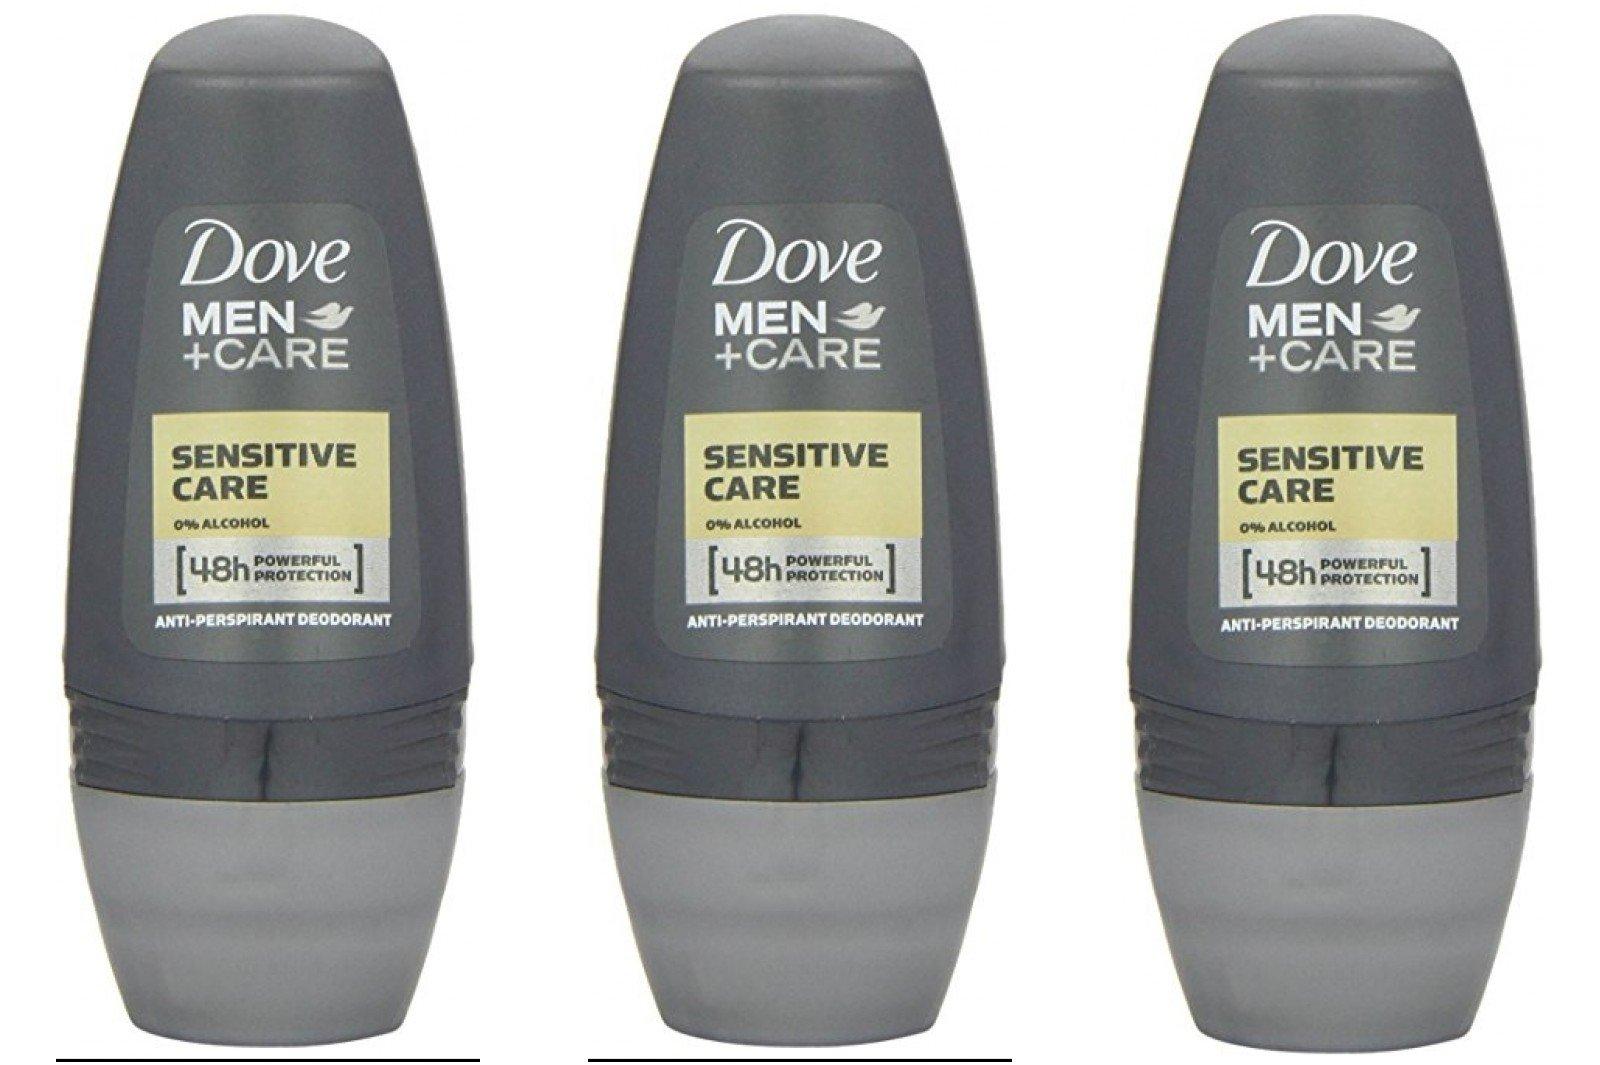 Dove Men+Care Sensitive Care Antiperspirant Deodorant Roll-On 1.7 Oz-50 Ml Travel Size (Pack of 3)